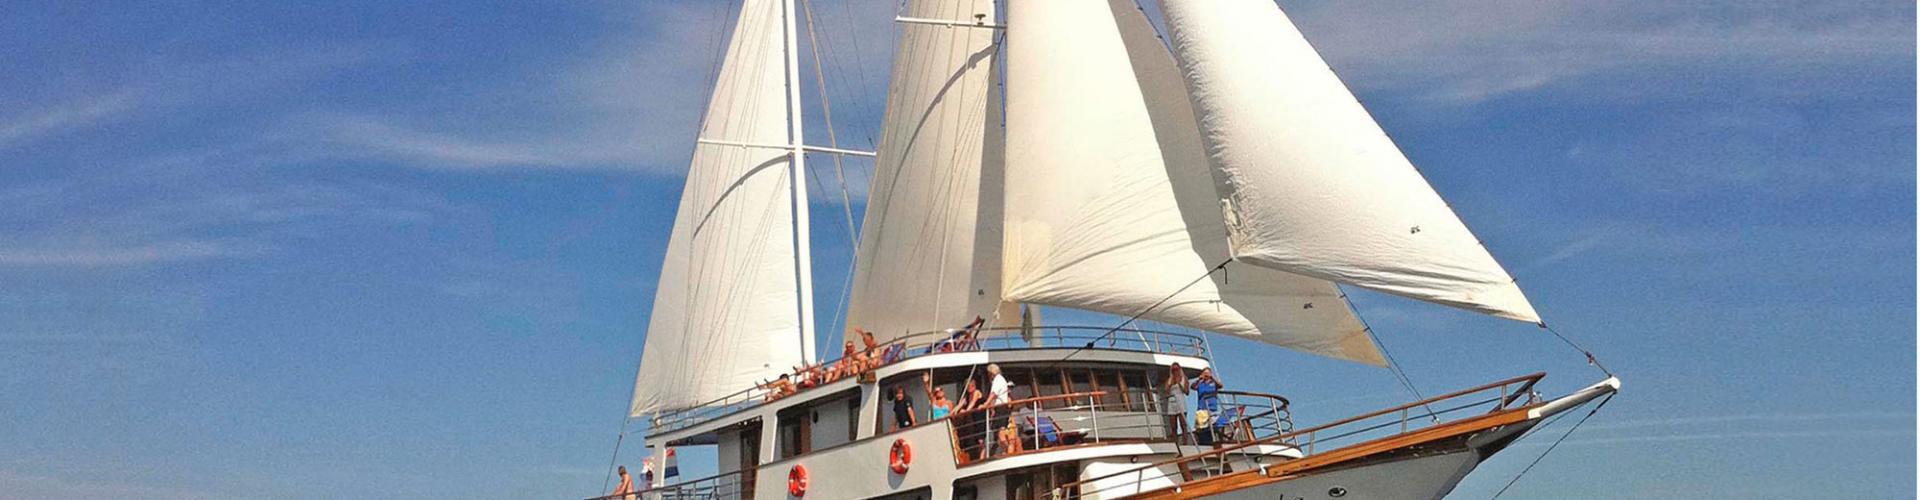 Premium cruiser MV Antonela- motor sailer